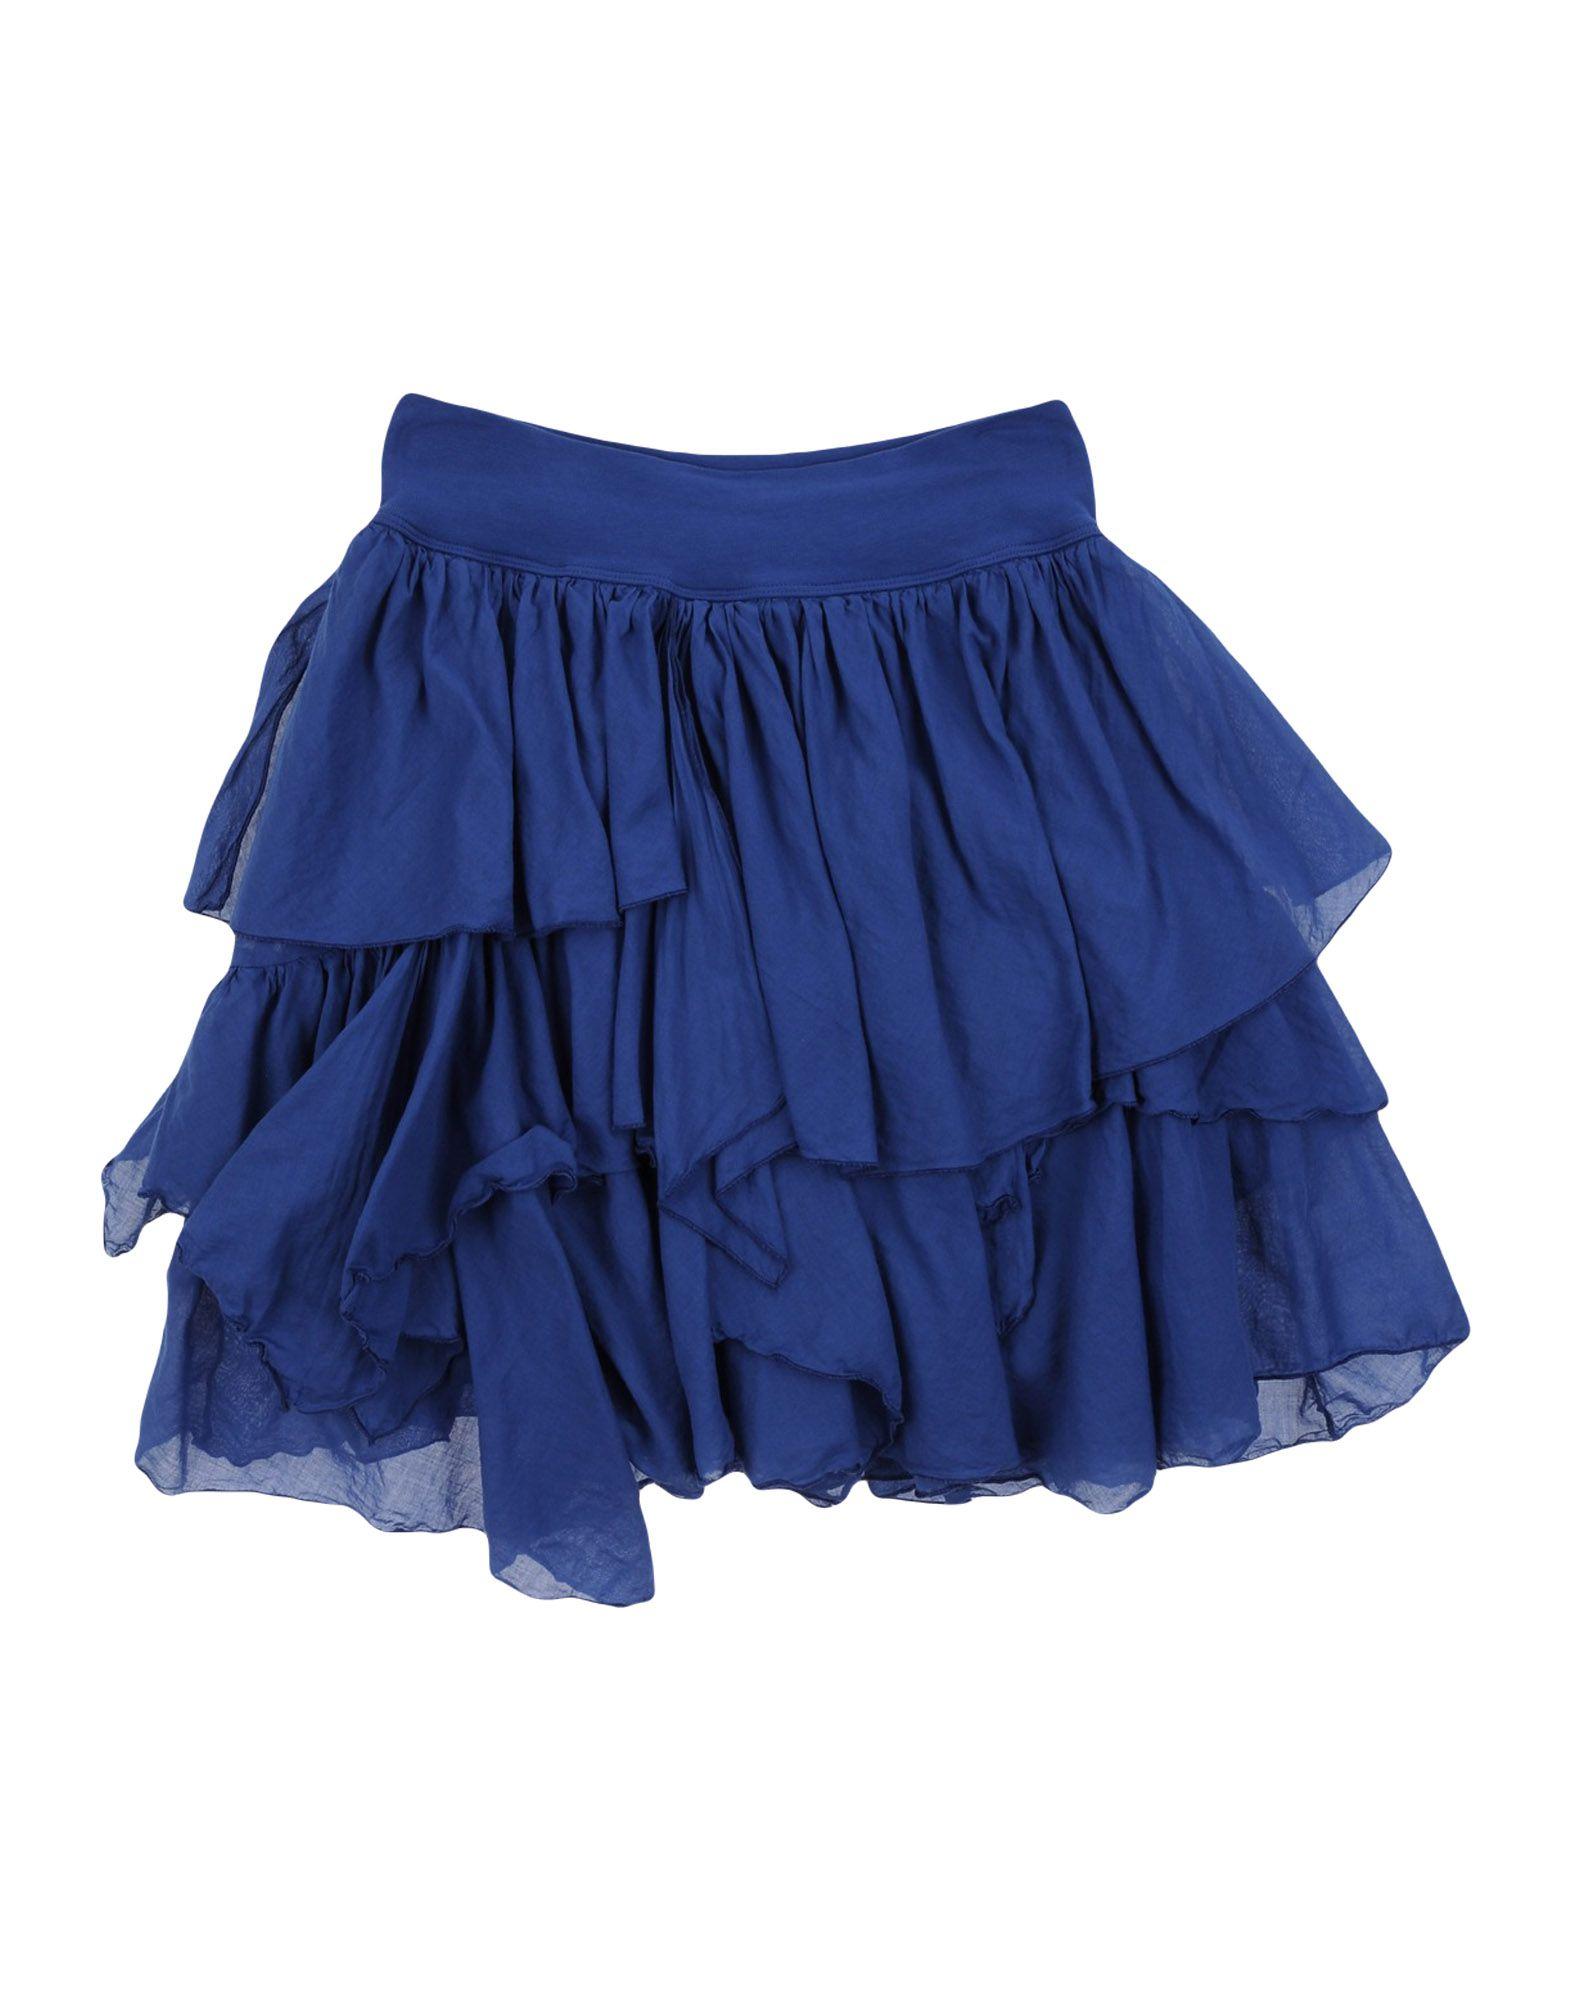 EUROPEAN CULTURE Mädchen 9-16 jahre Rock Farbe Blau Größe 6